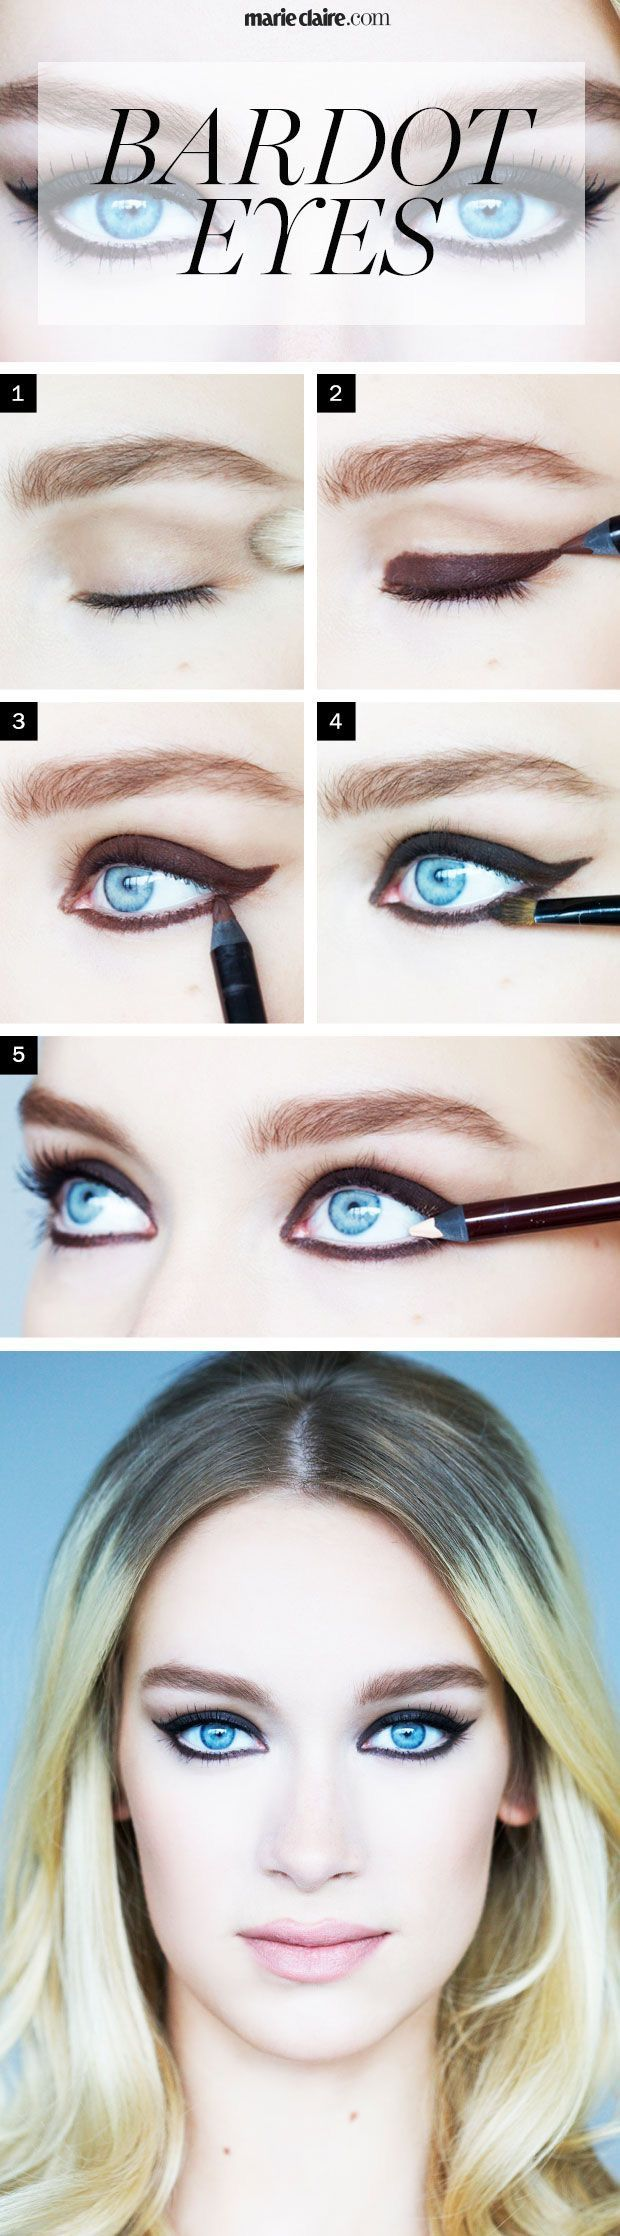 Schlafzimmer Augen, Beauty Tipps, Schönheitstricks, Augen Make Up  Anleitungen, Make Up Tipps, Make Up Ideen, Eyeliner Tutorial, Modetrends,  Frisuren